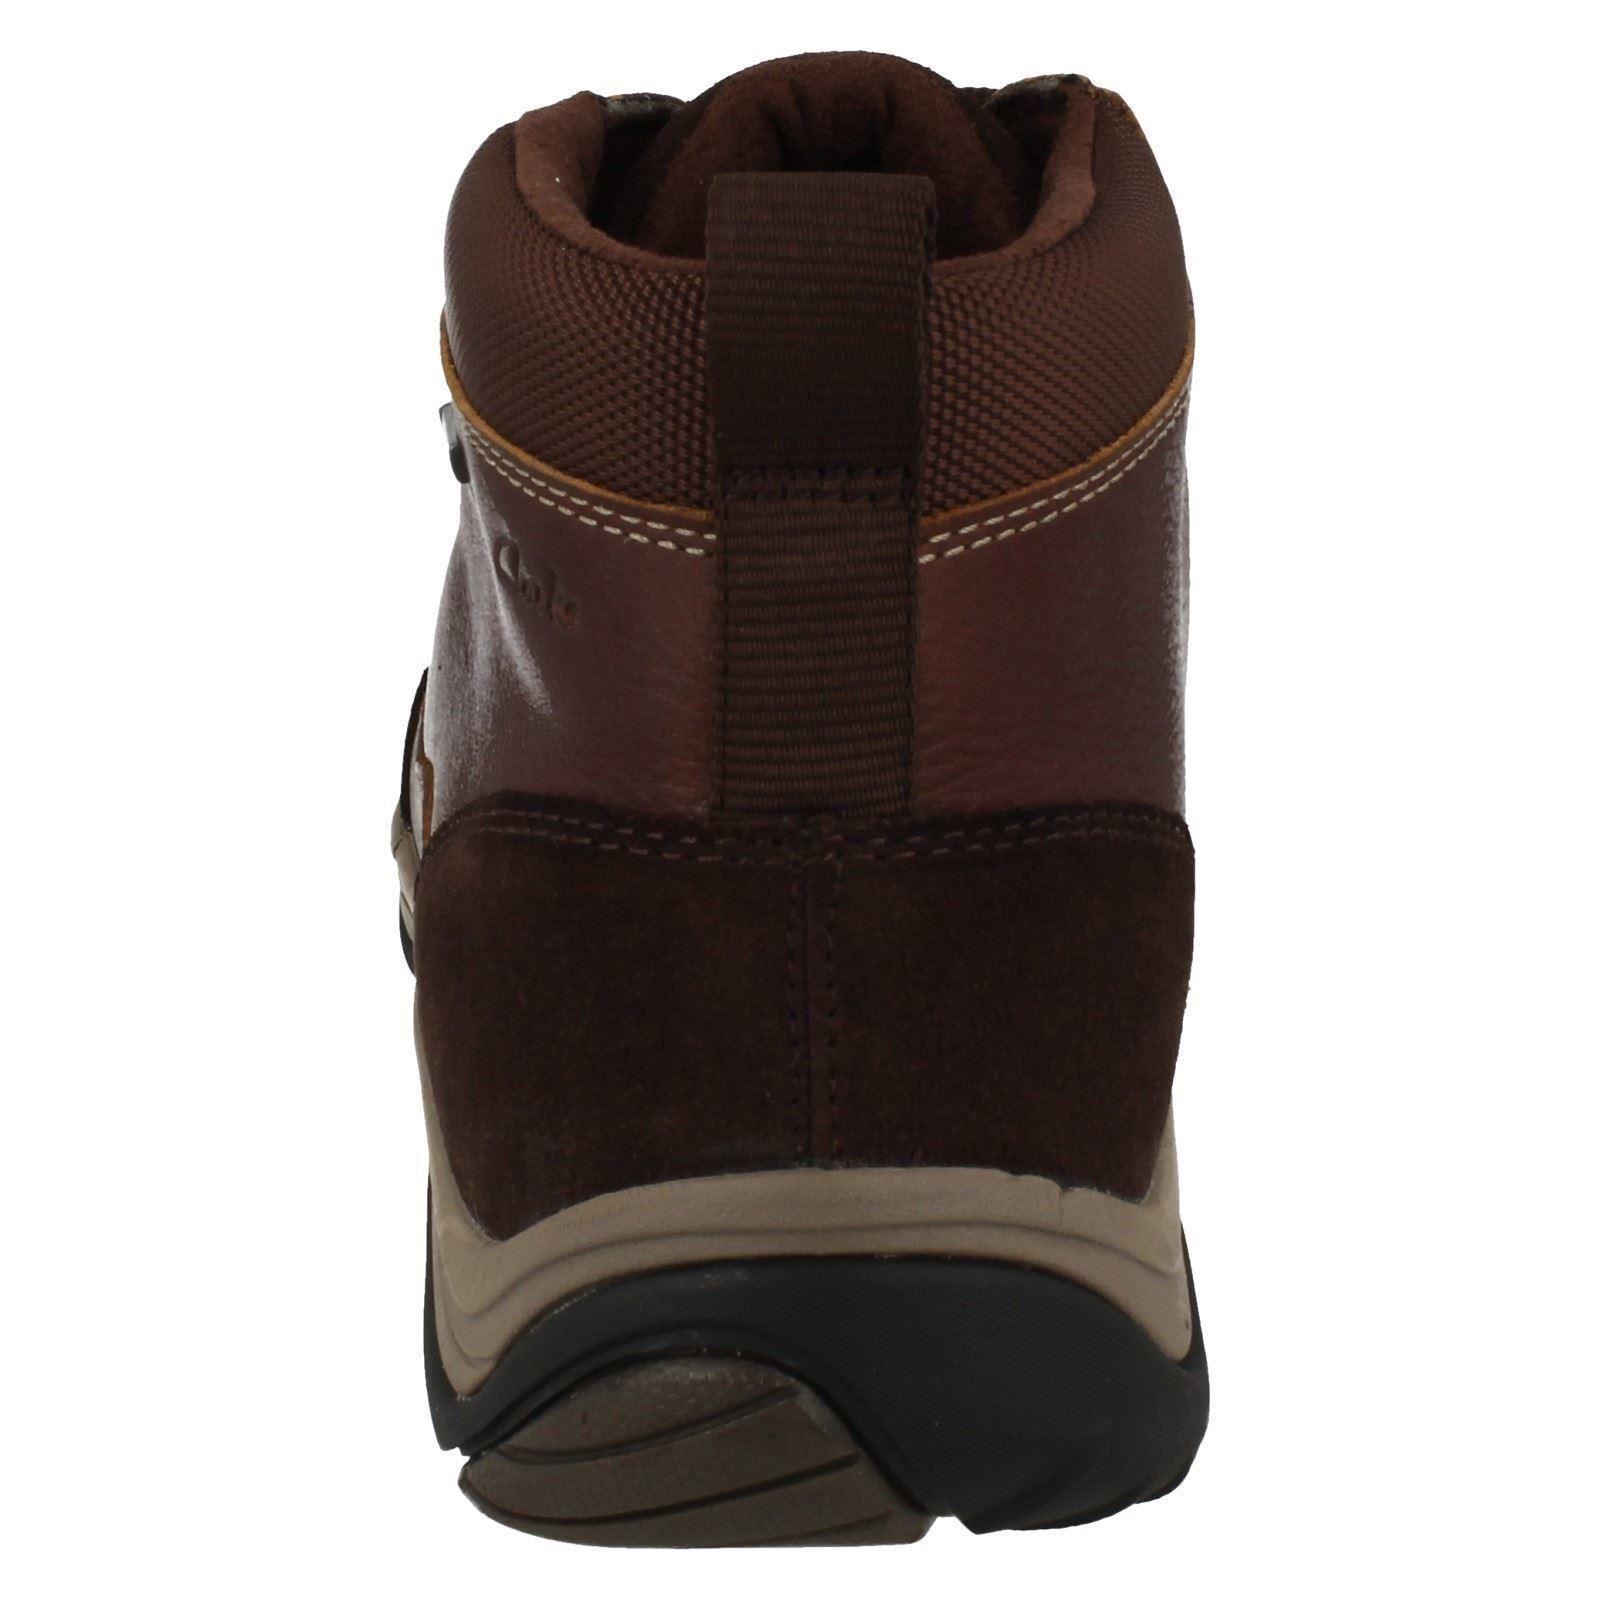 Men's Clarks Waterproof Lace Up Stiefel Label - Baystonetop GTX